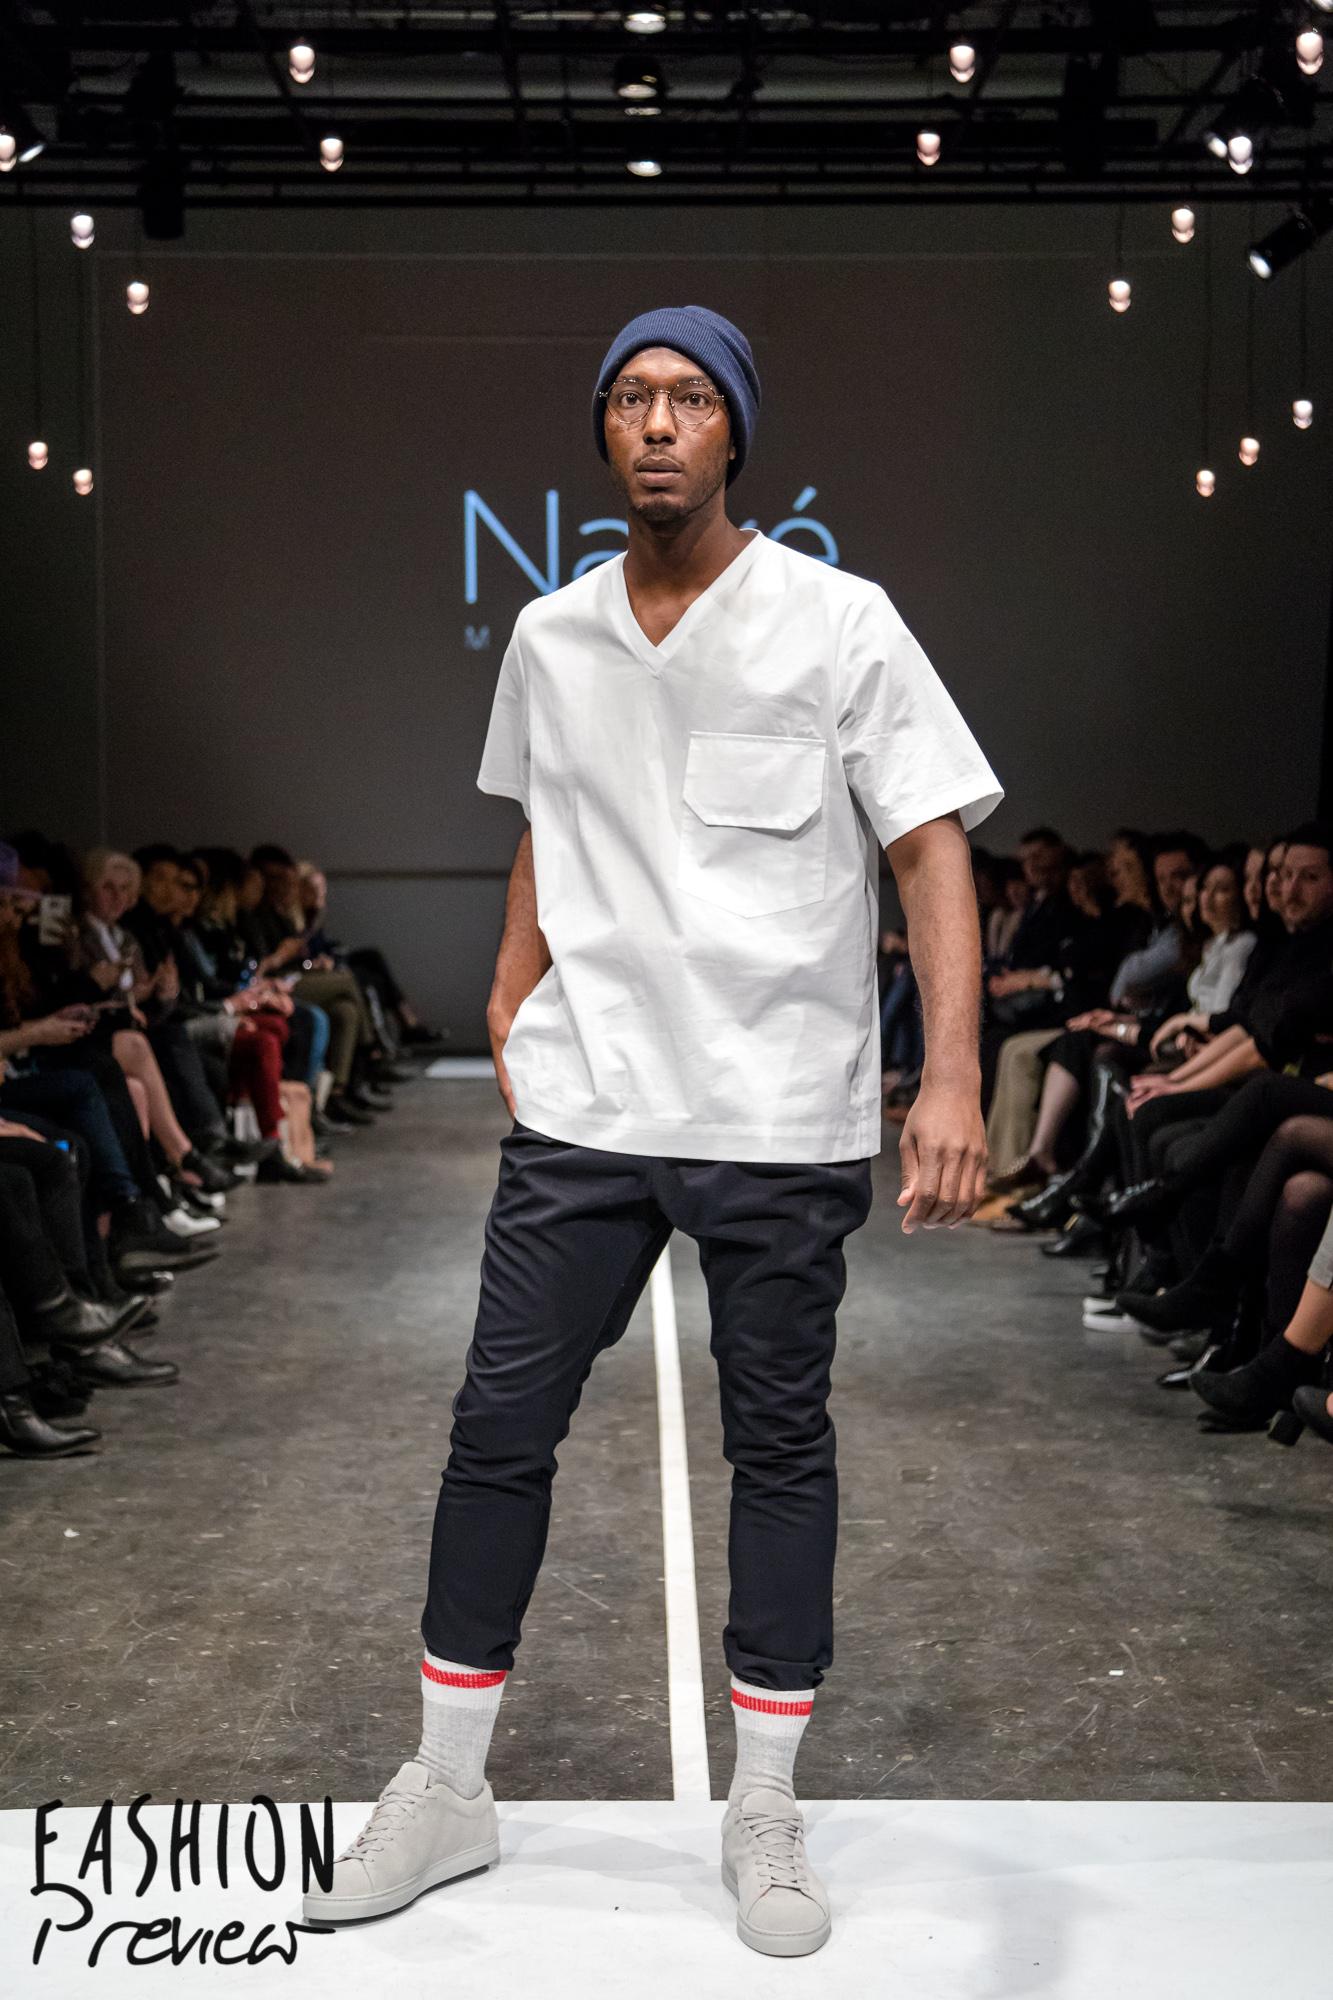 Fashion Preview 9 - Naike-06.jpg